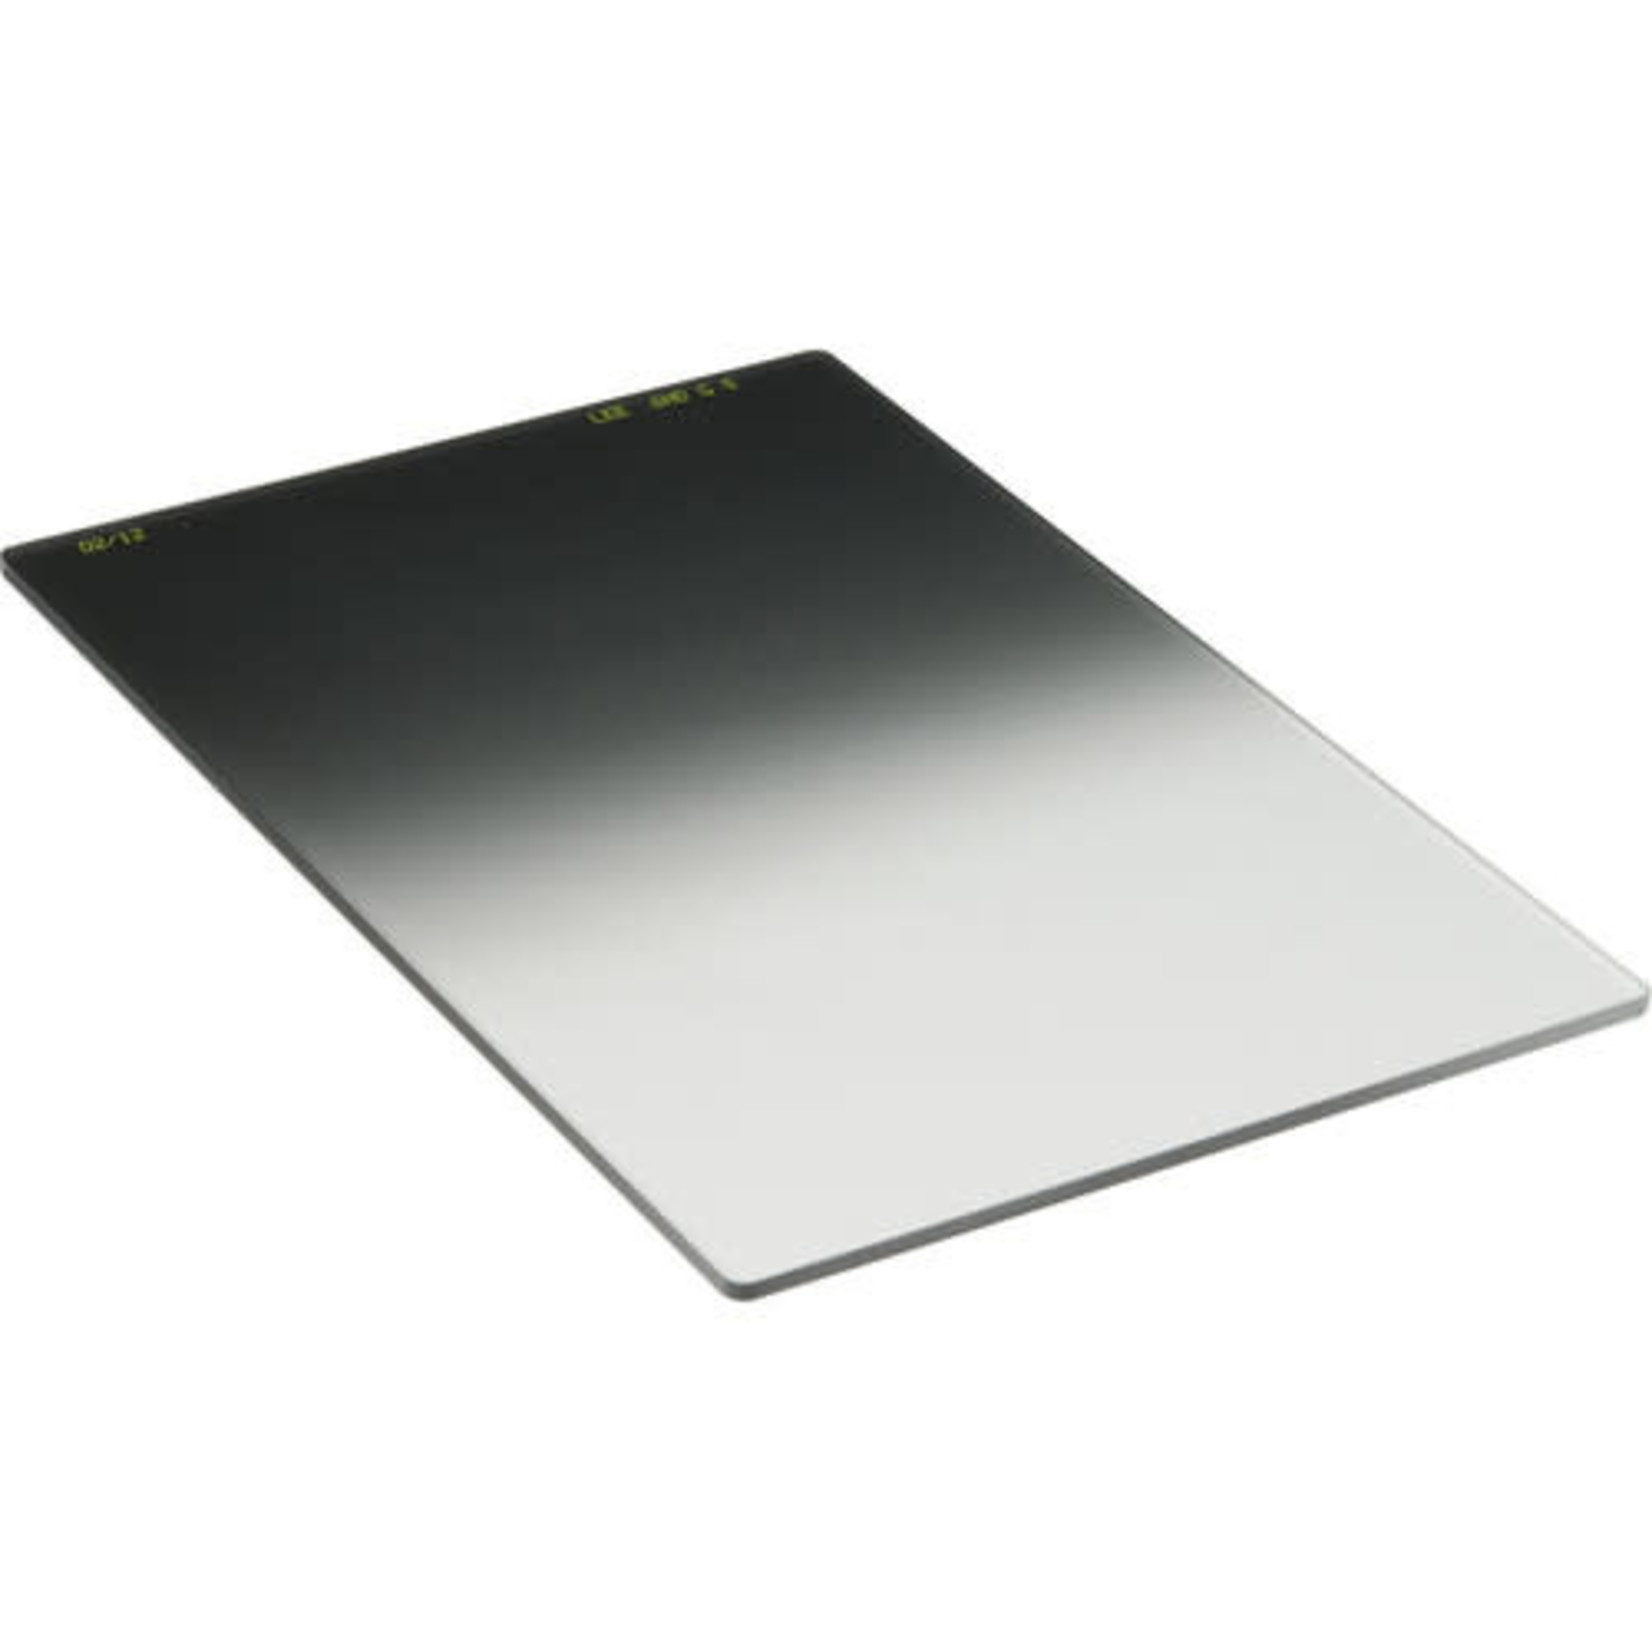 Lee LEE Filters 100 x 150mm Soft Graduated Neutral Density 0.6 Filter